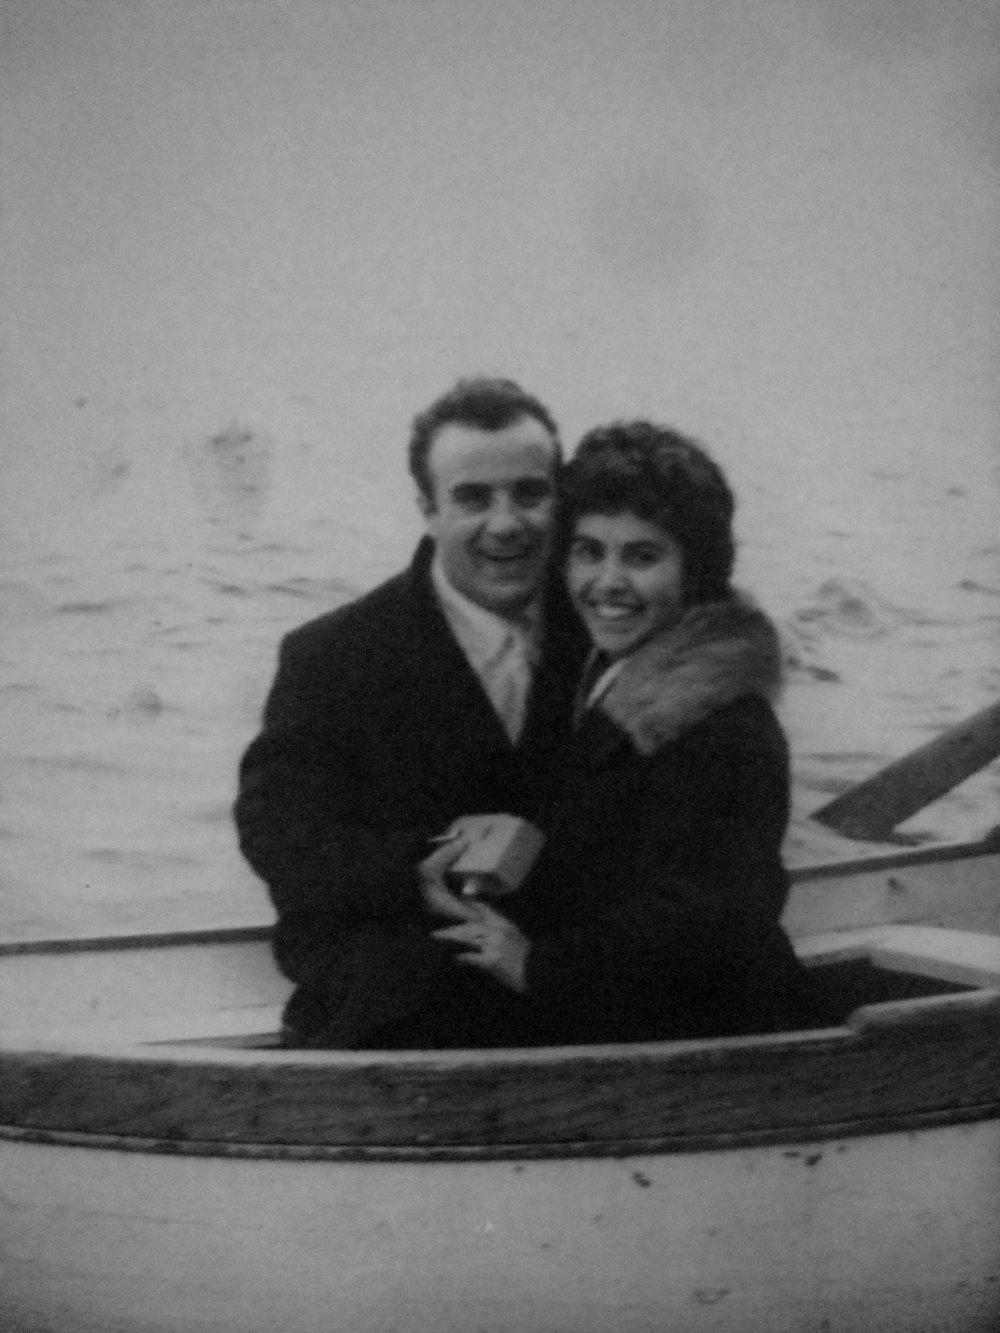 Angelino and Giovanna Primavera, 1960's